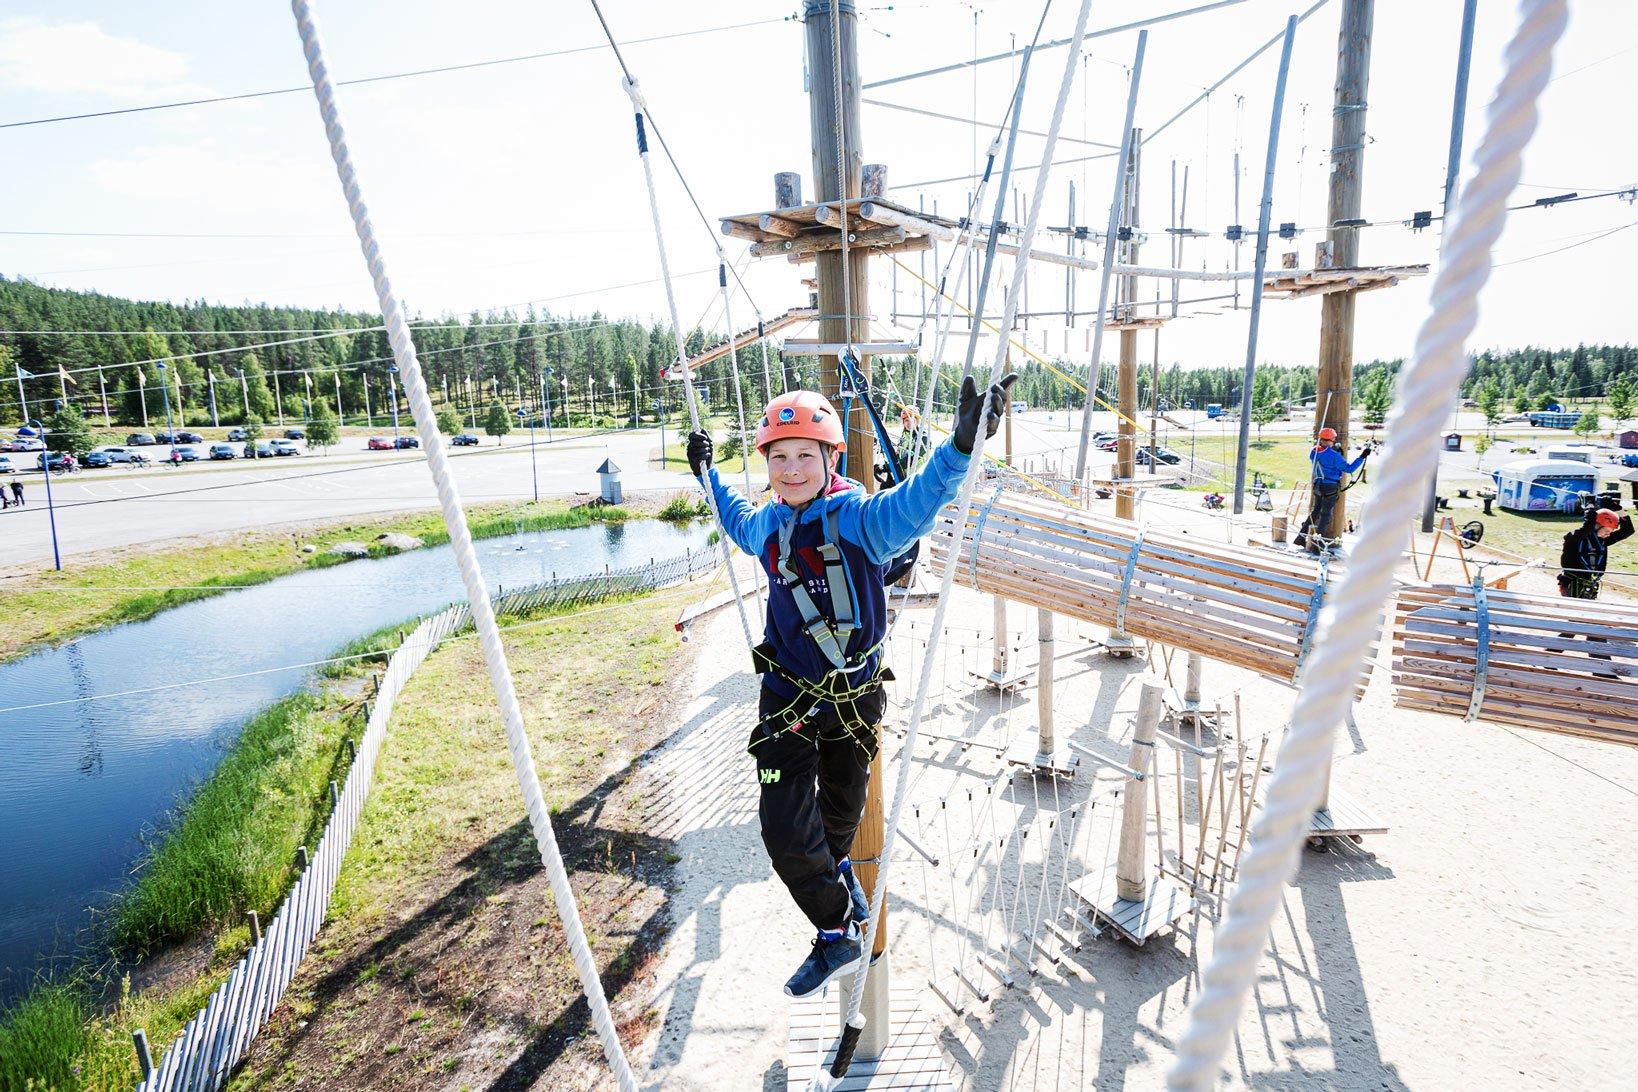 Levi-Summer-Resort-seikkailupuisto-activitypark-v2